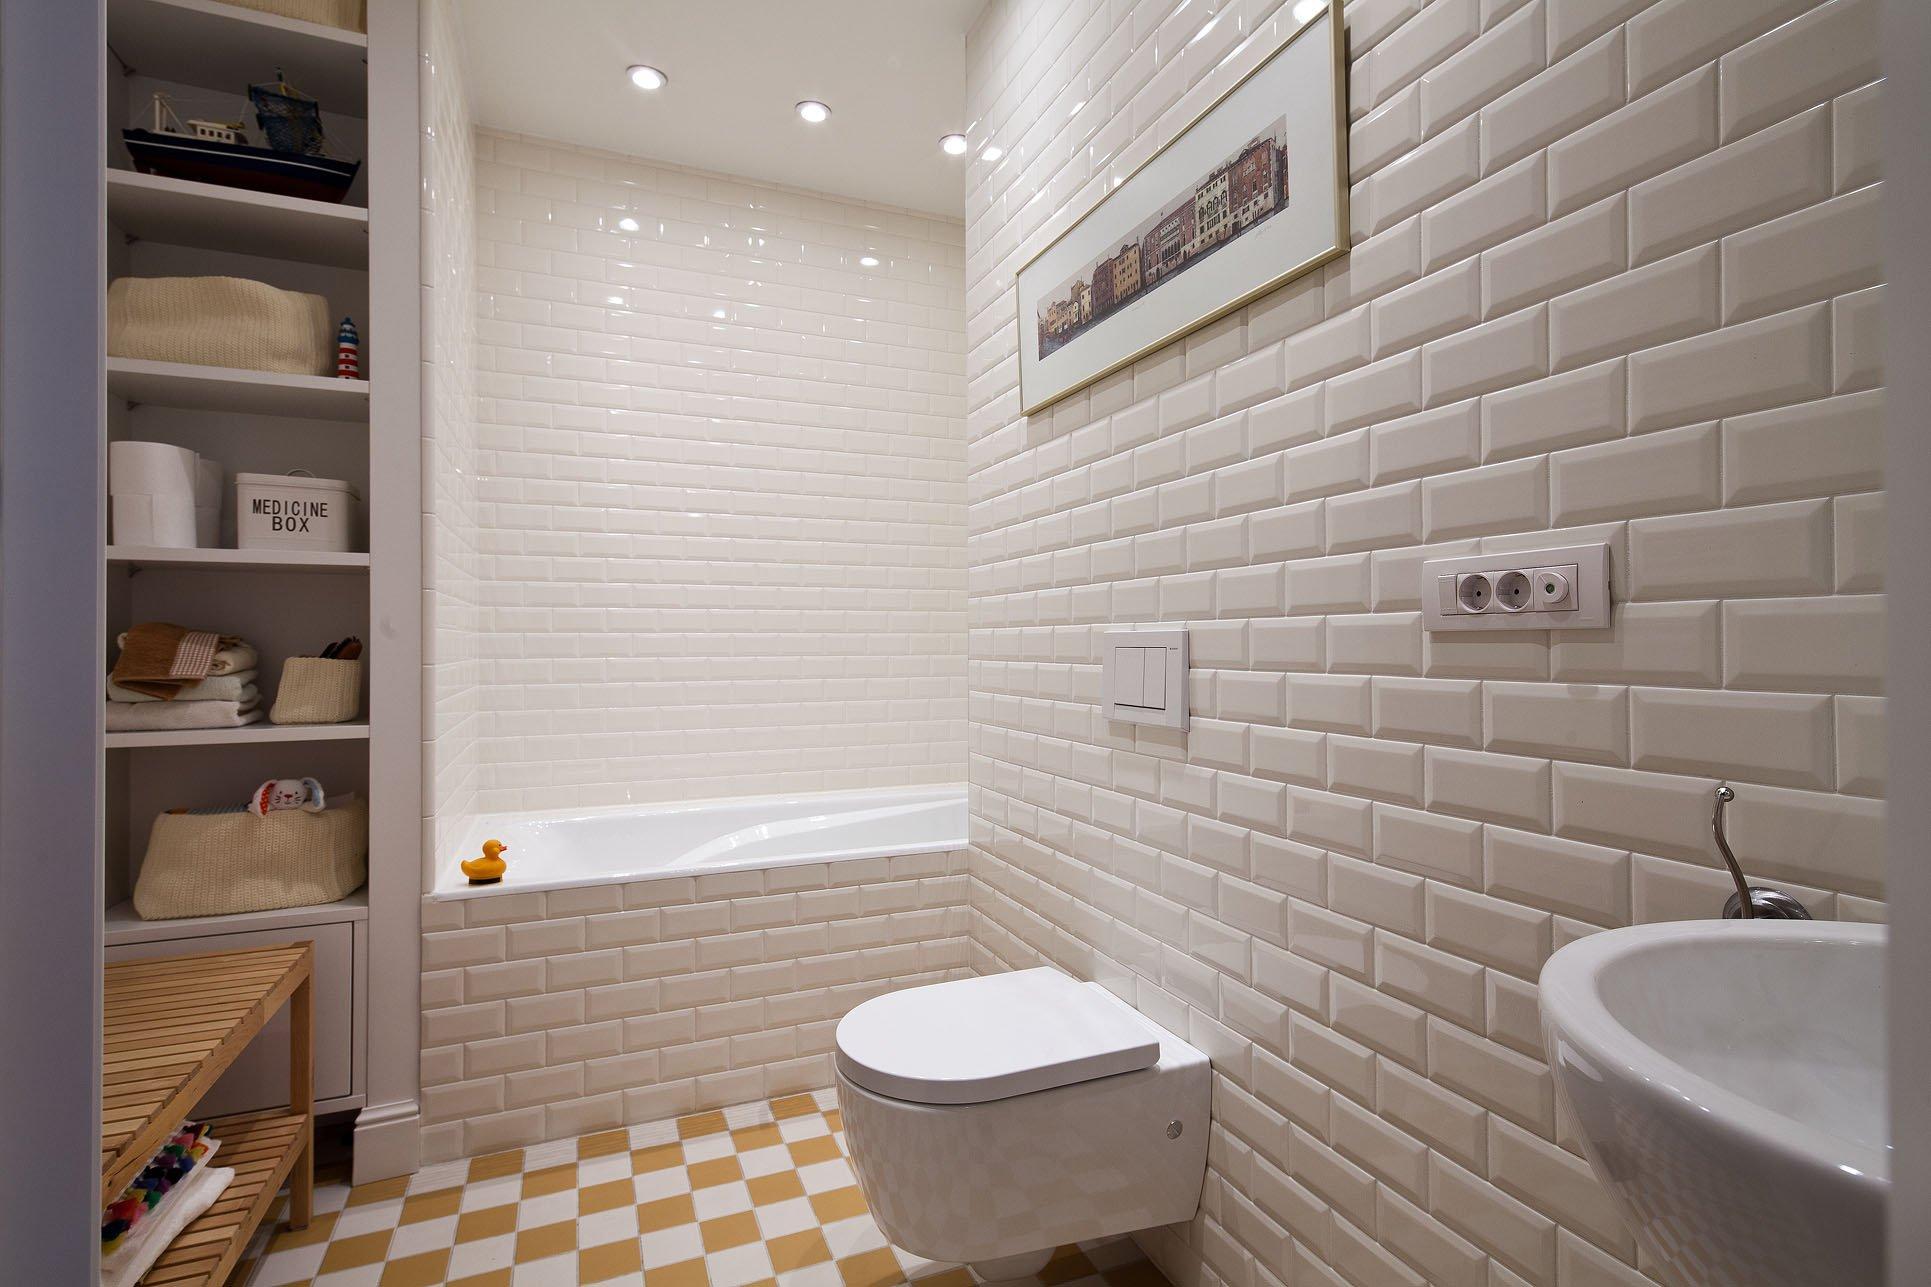 плитка в ванной под кирпич